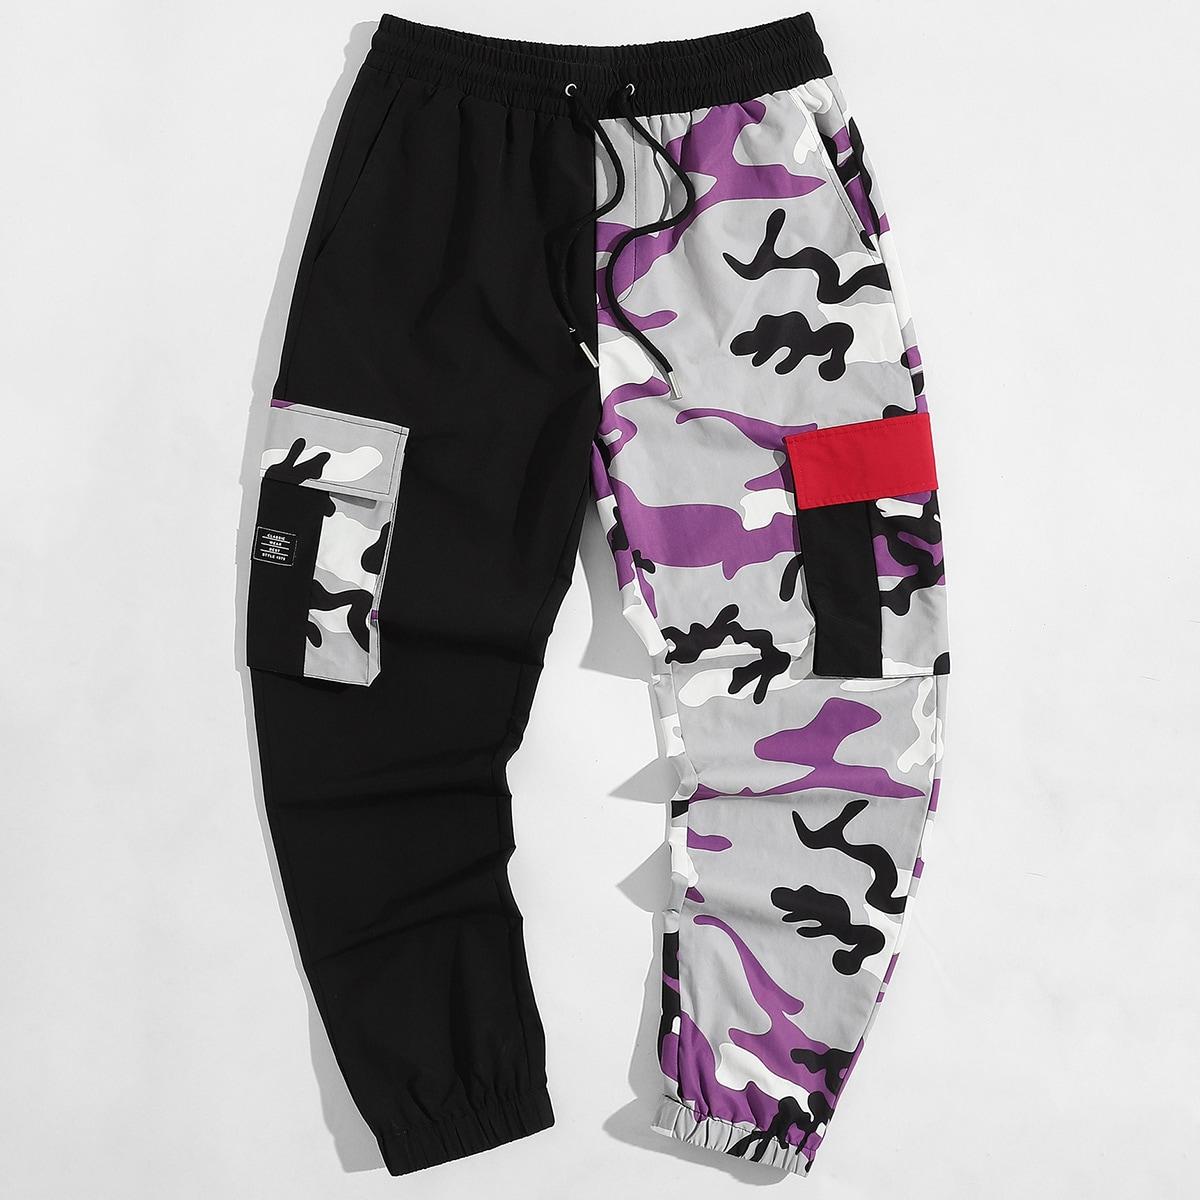 Men Flap Pocket Camo Drawstring Pants, SHEIN  - buy with discount